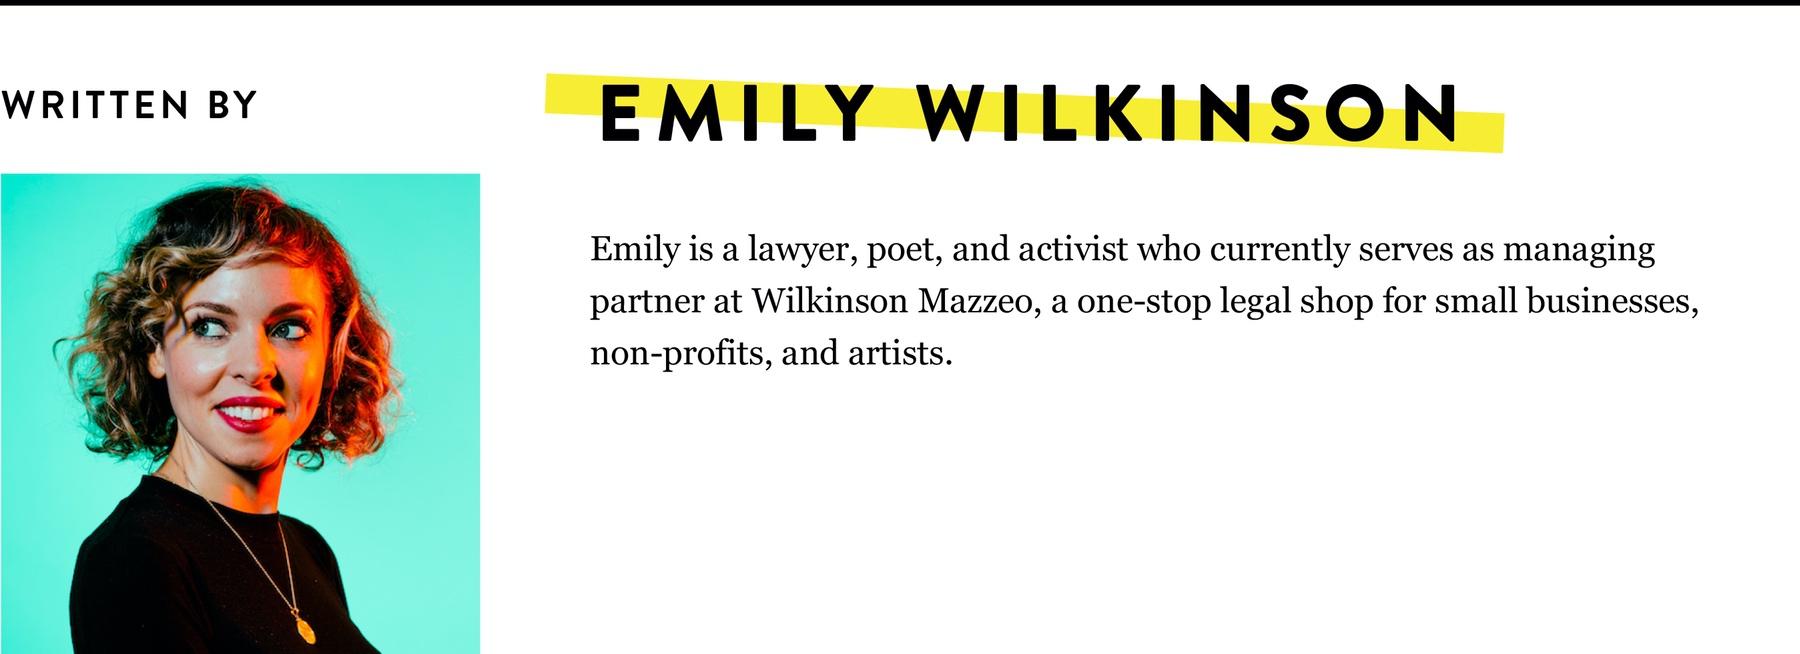 Emily Wilkinson Bio